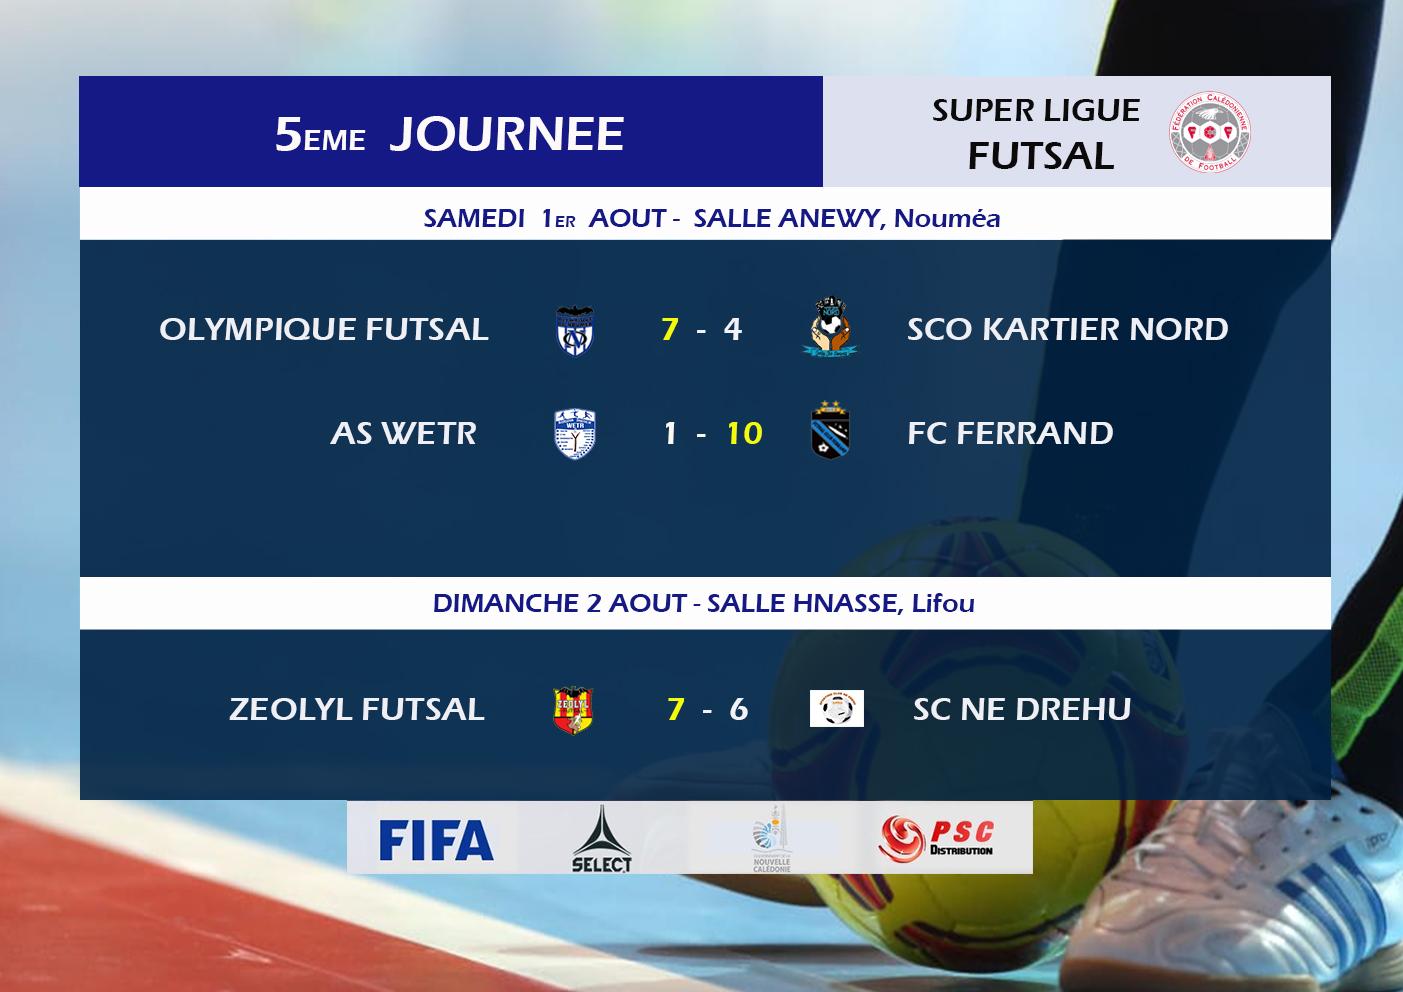 ZEOLYL Futsal en tête de la Super Ligue / Résultats-Classements du week-end